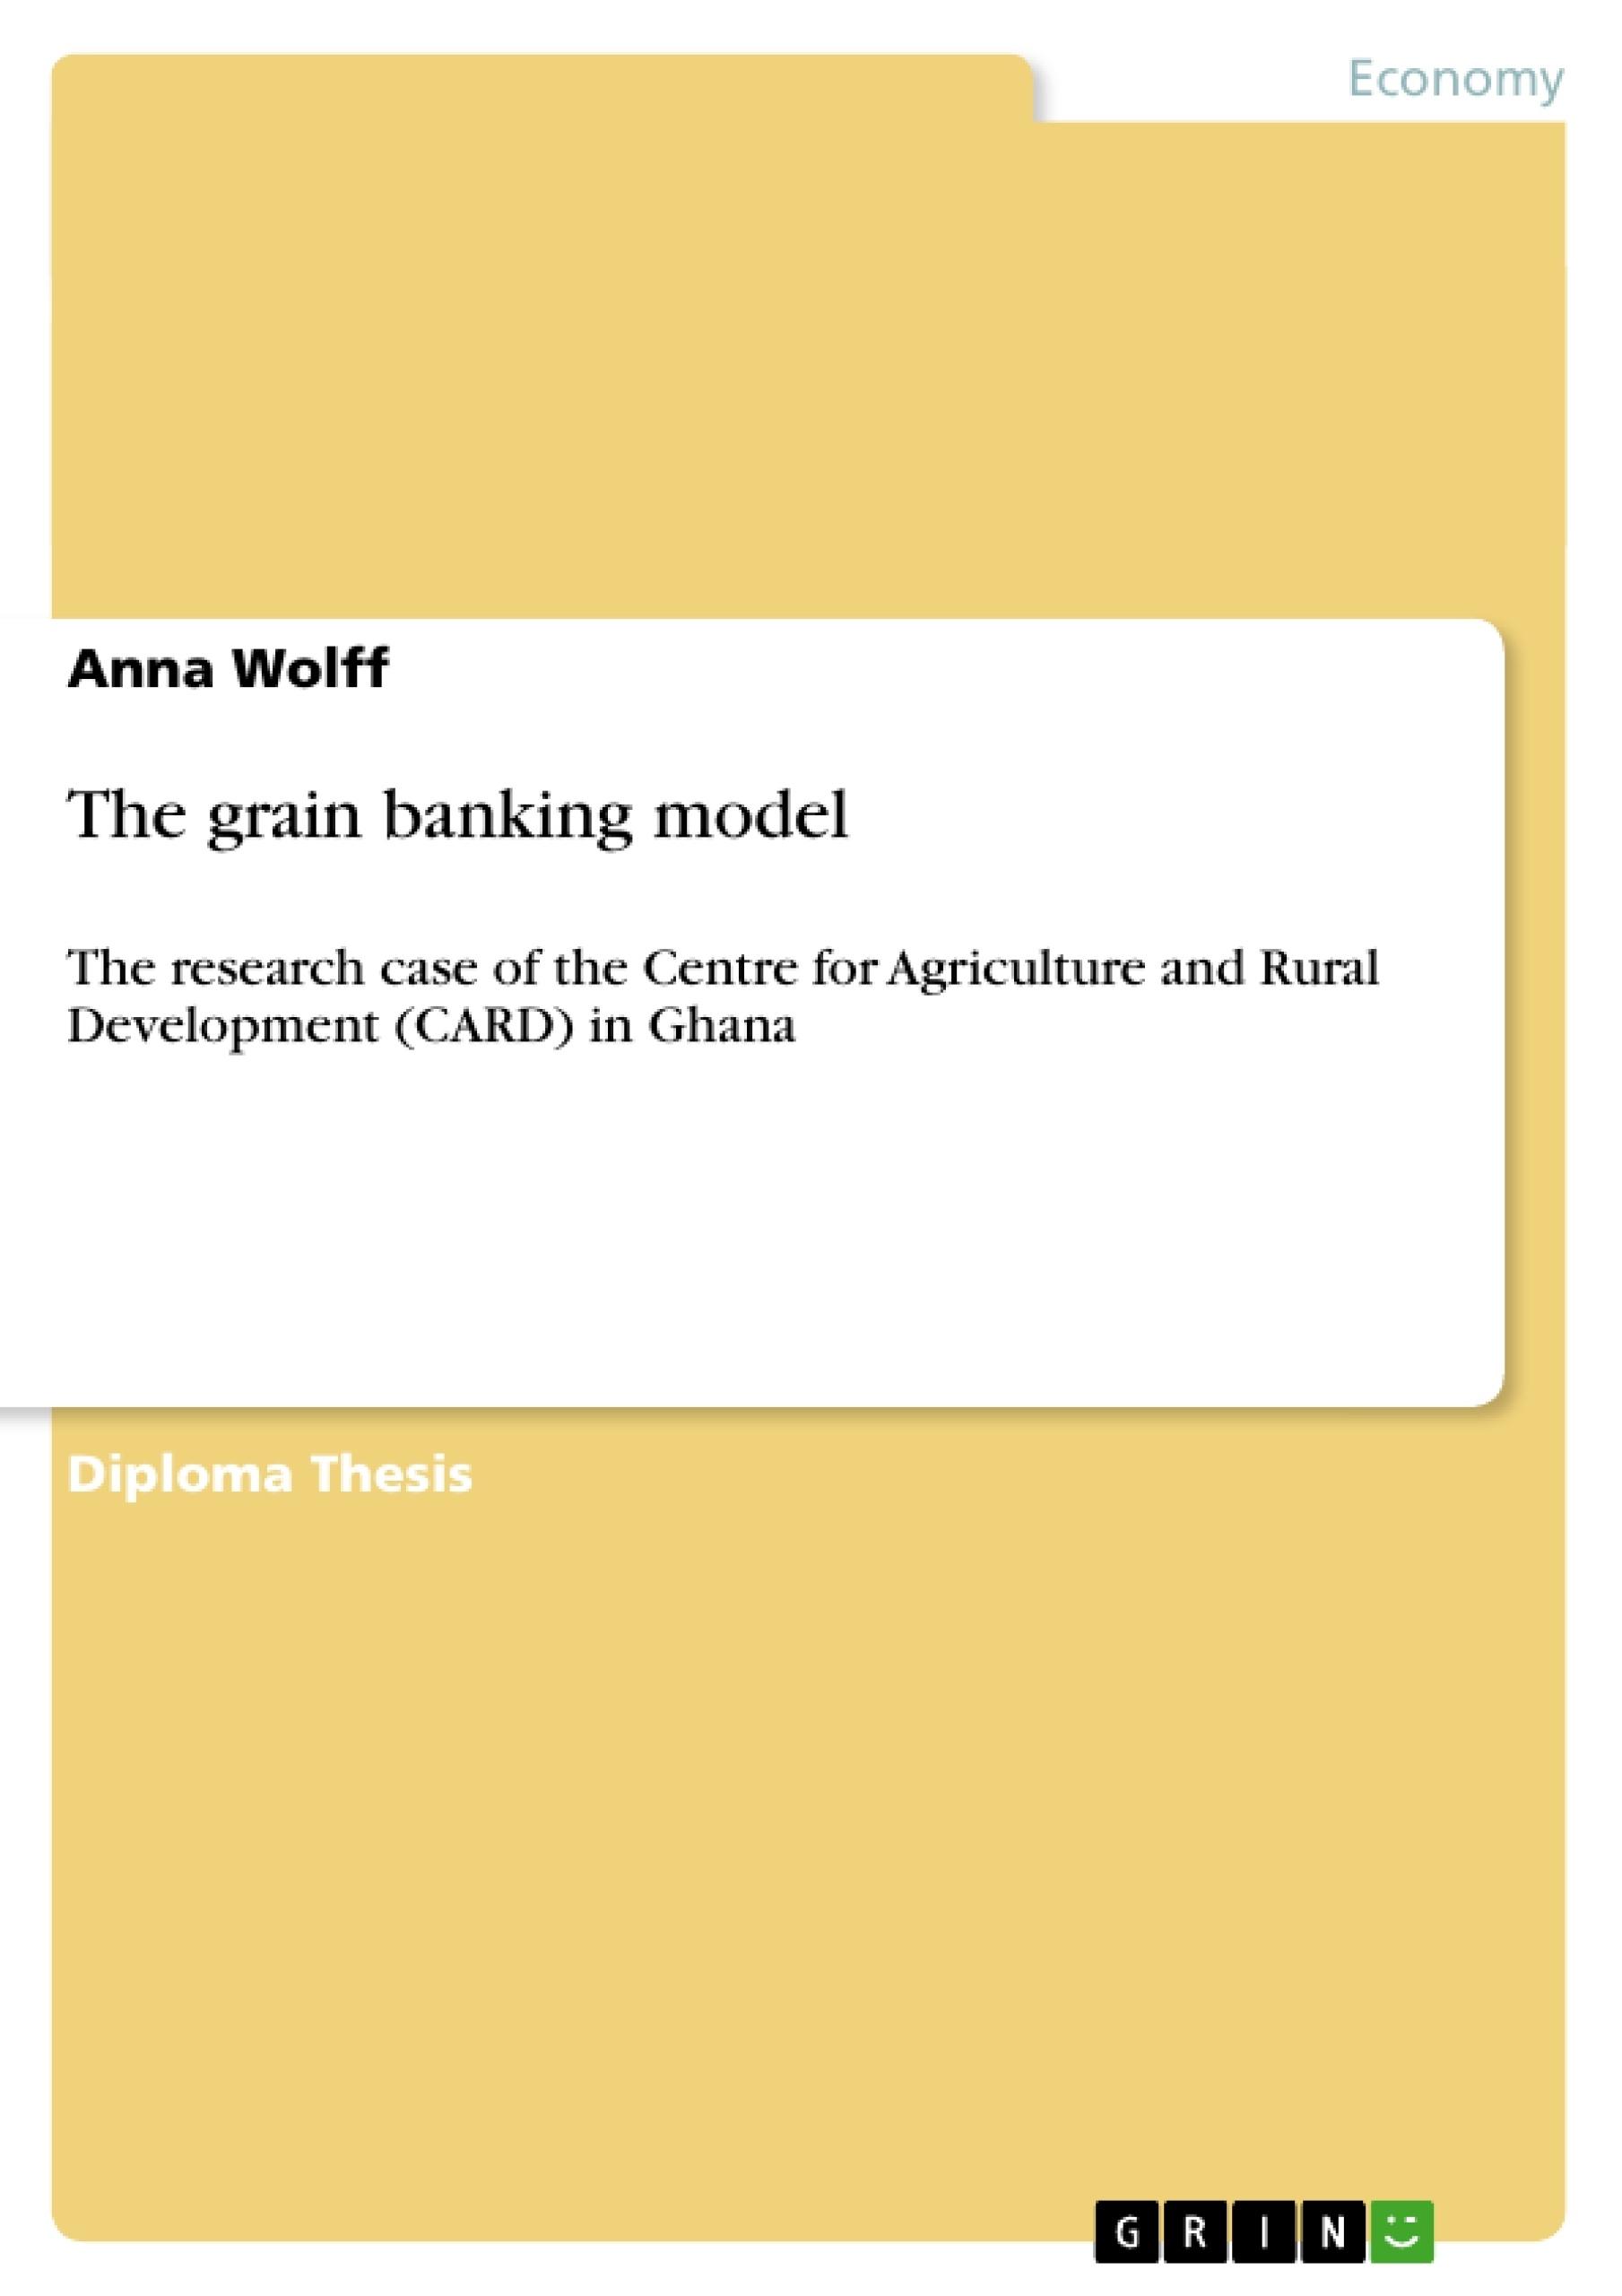 GRIN - The grain banking model